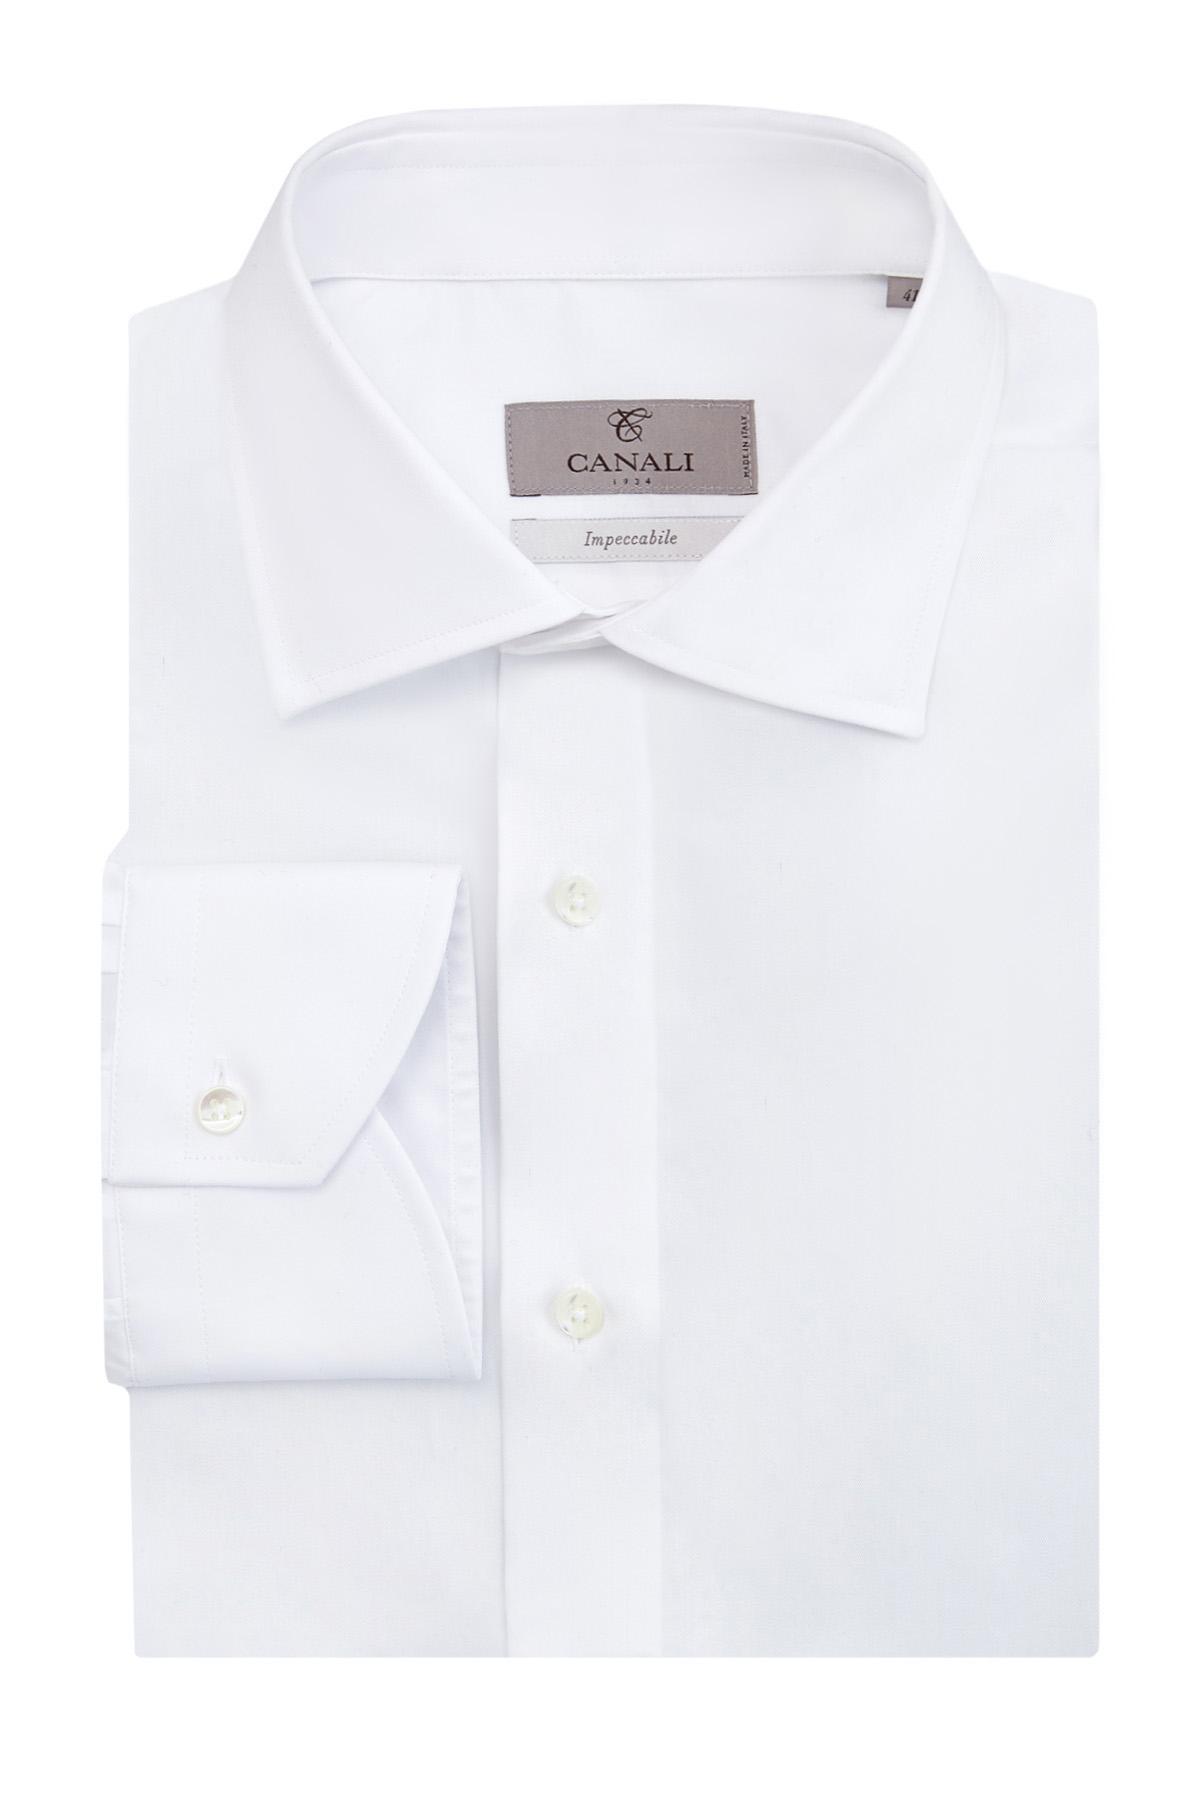 Рубашка из поплина с обработкой Impeccabile против складок